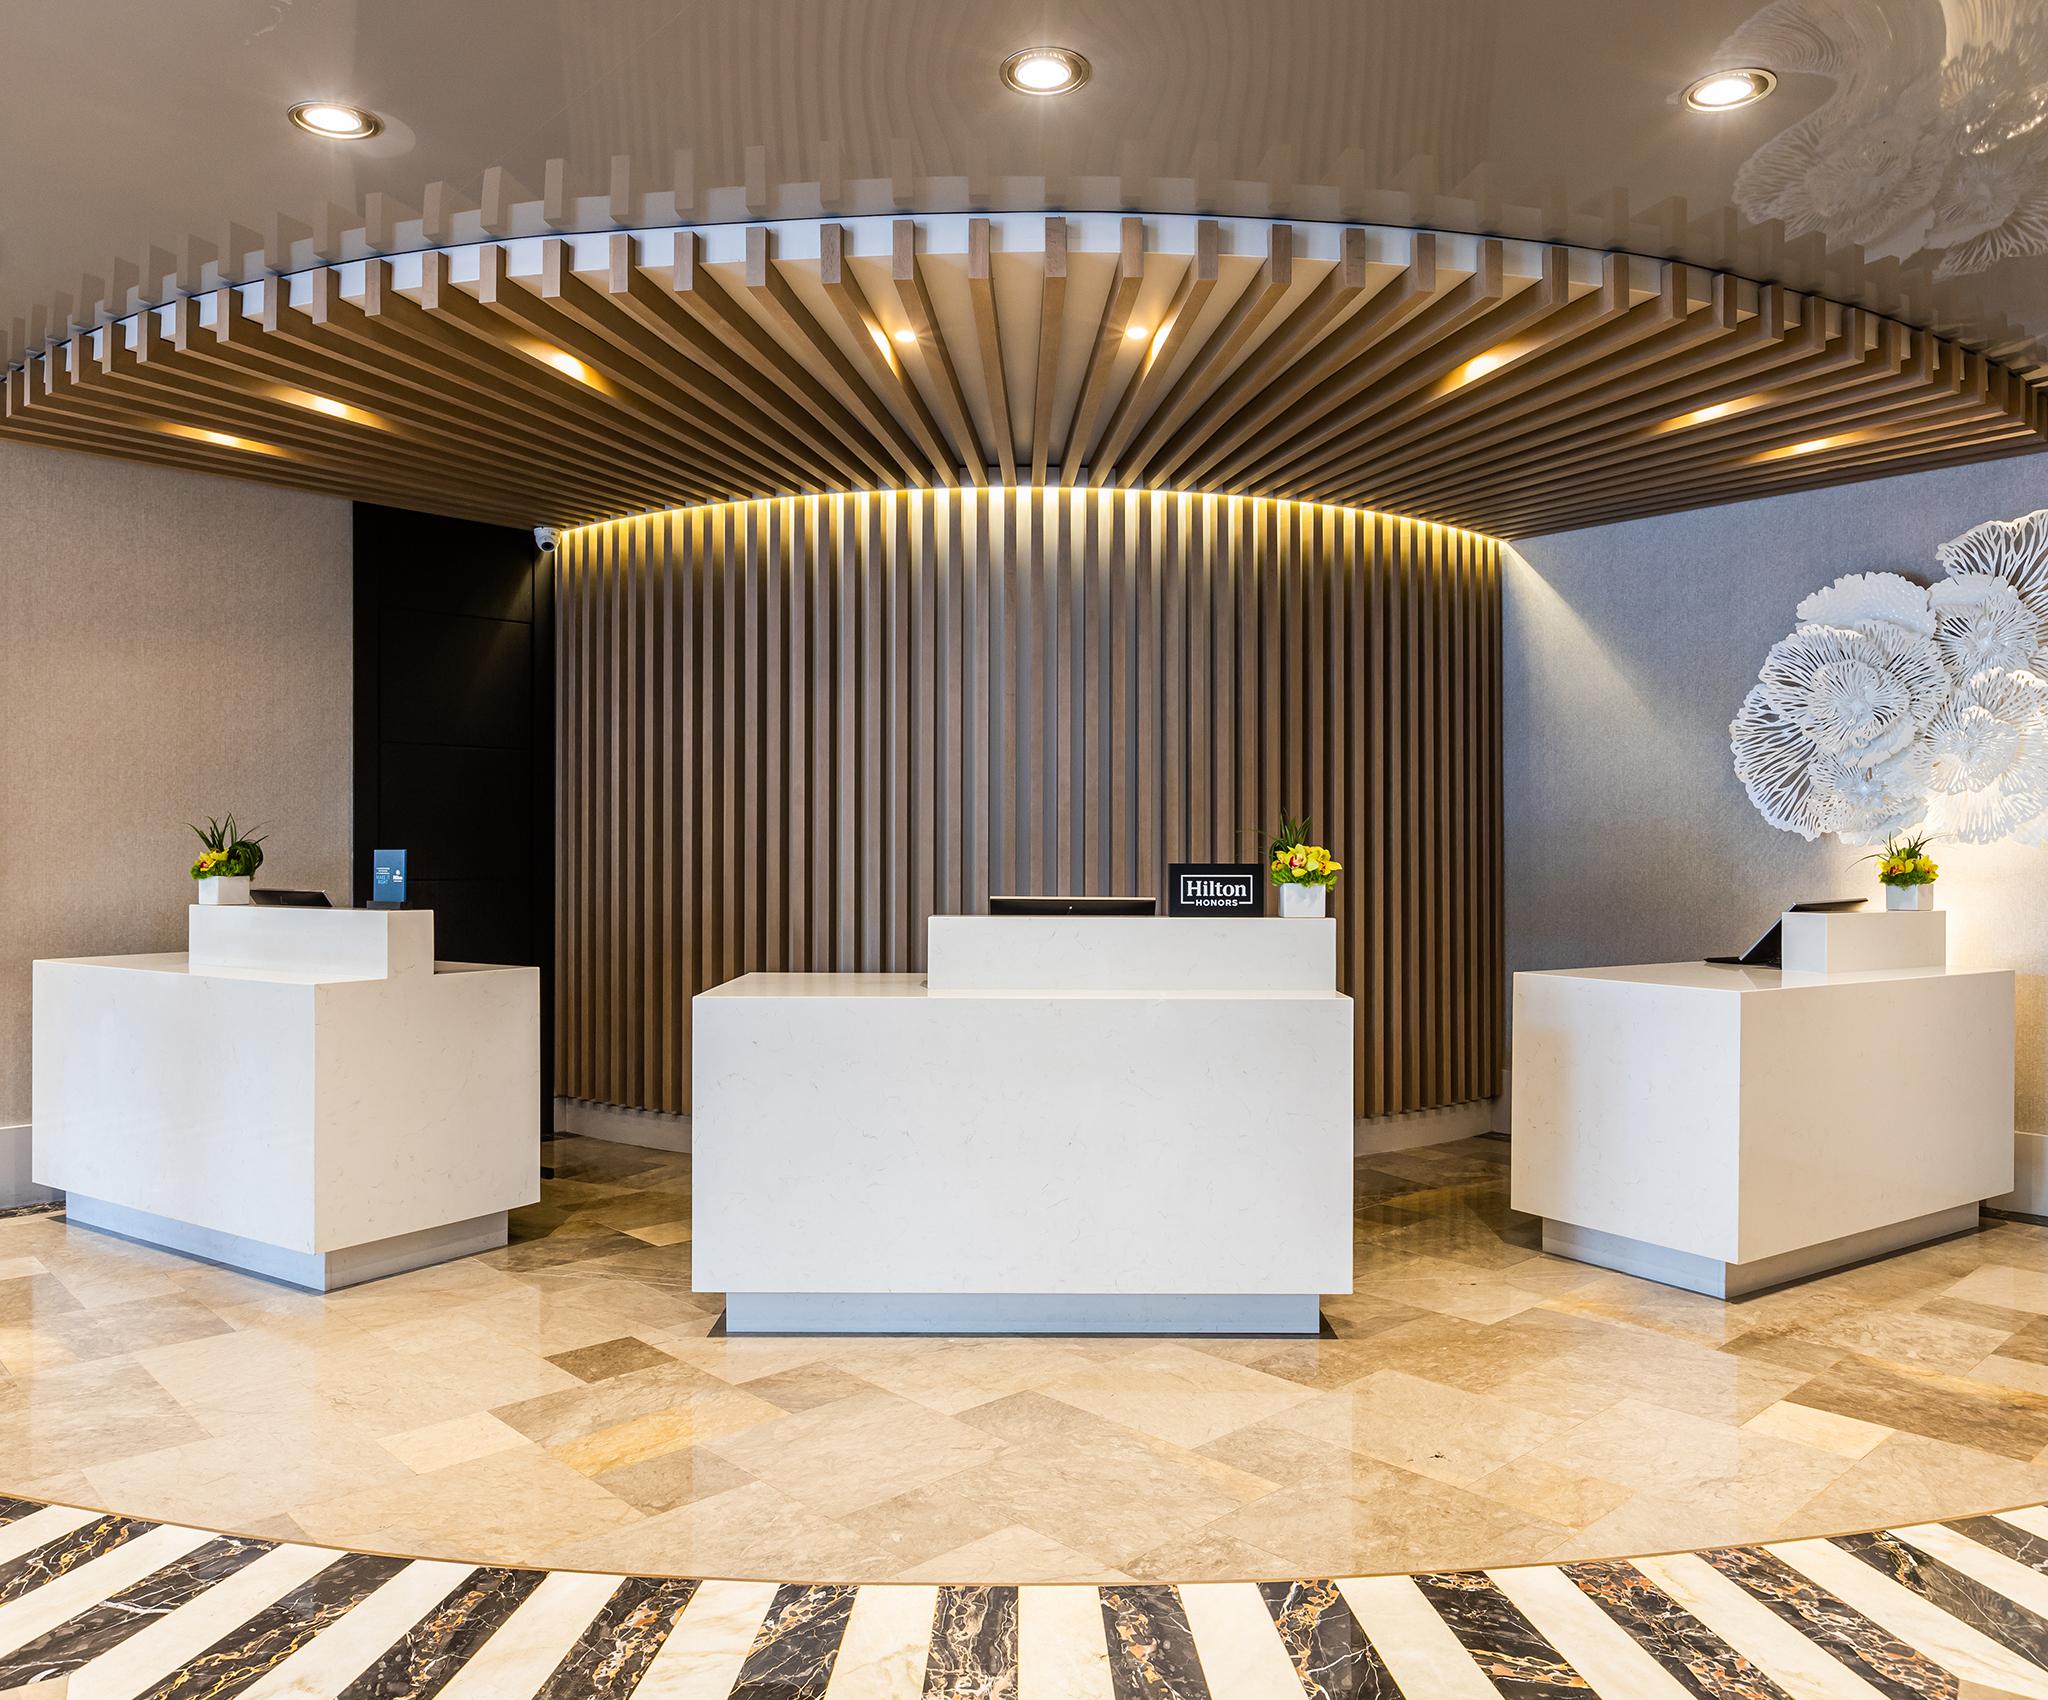 Hilton Bentley Miami South Beach Hotel Lobby 1